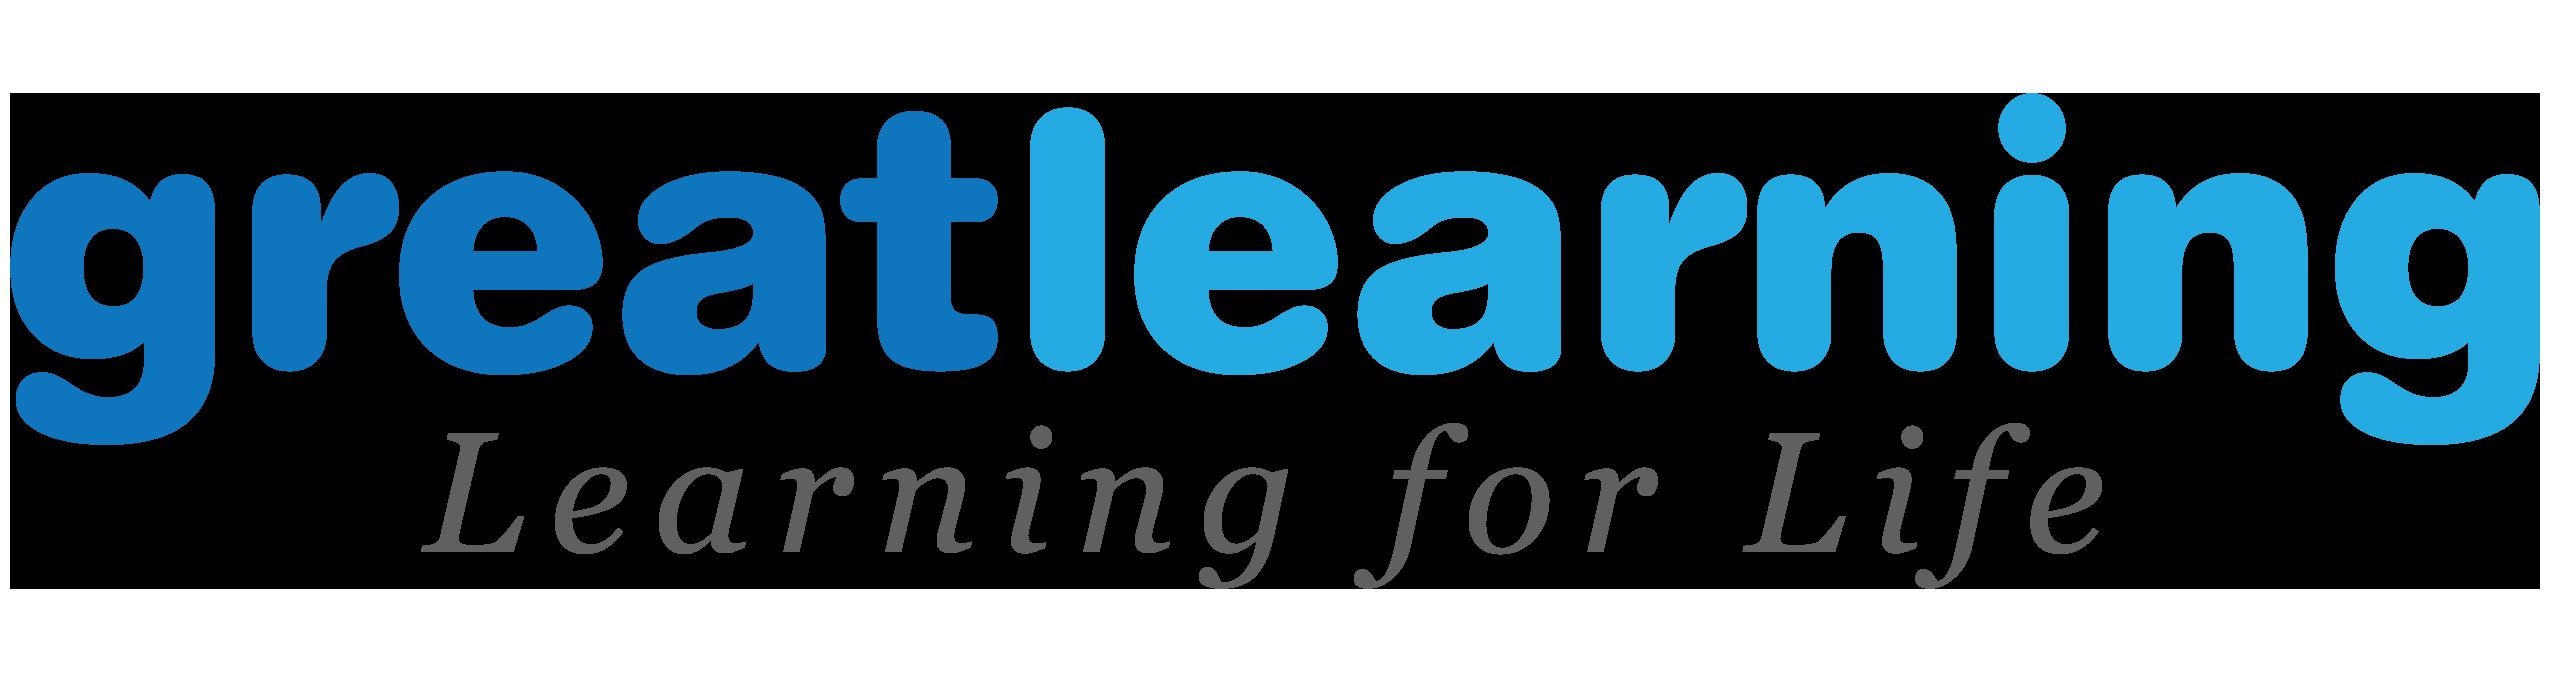 greatlearning logo